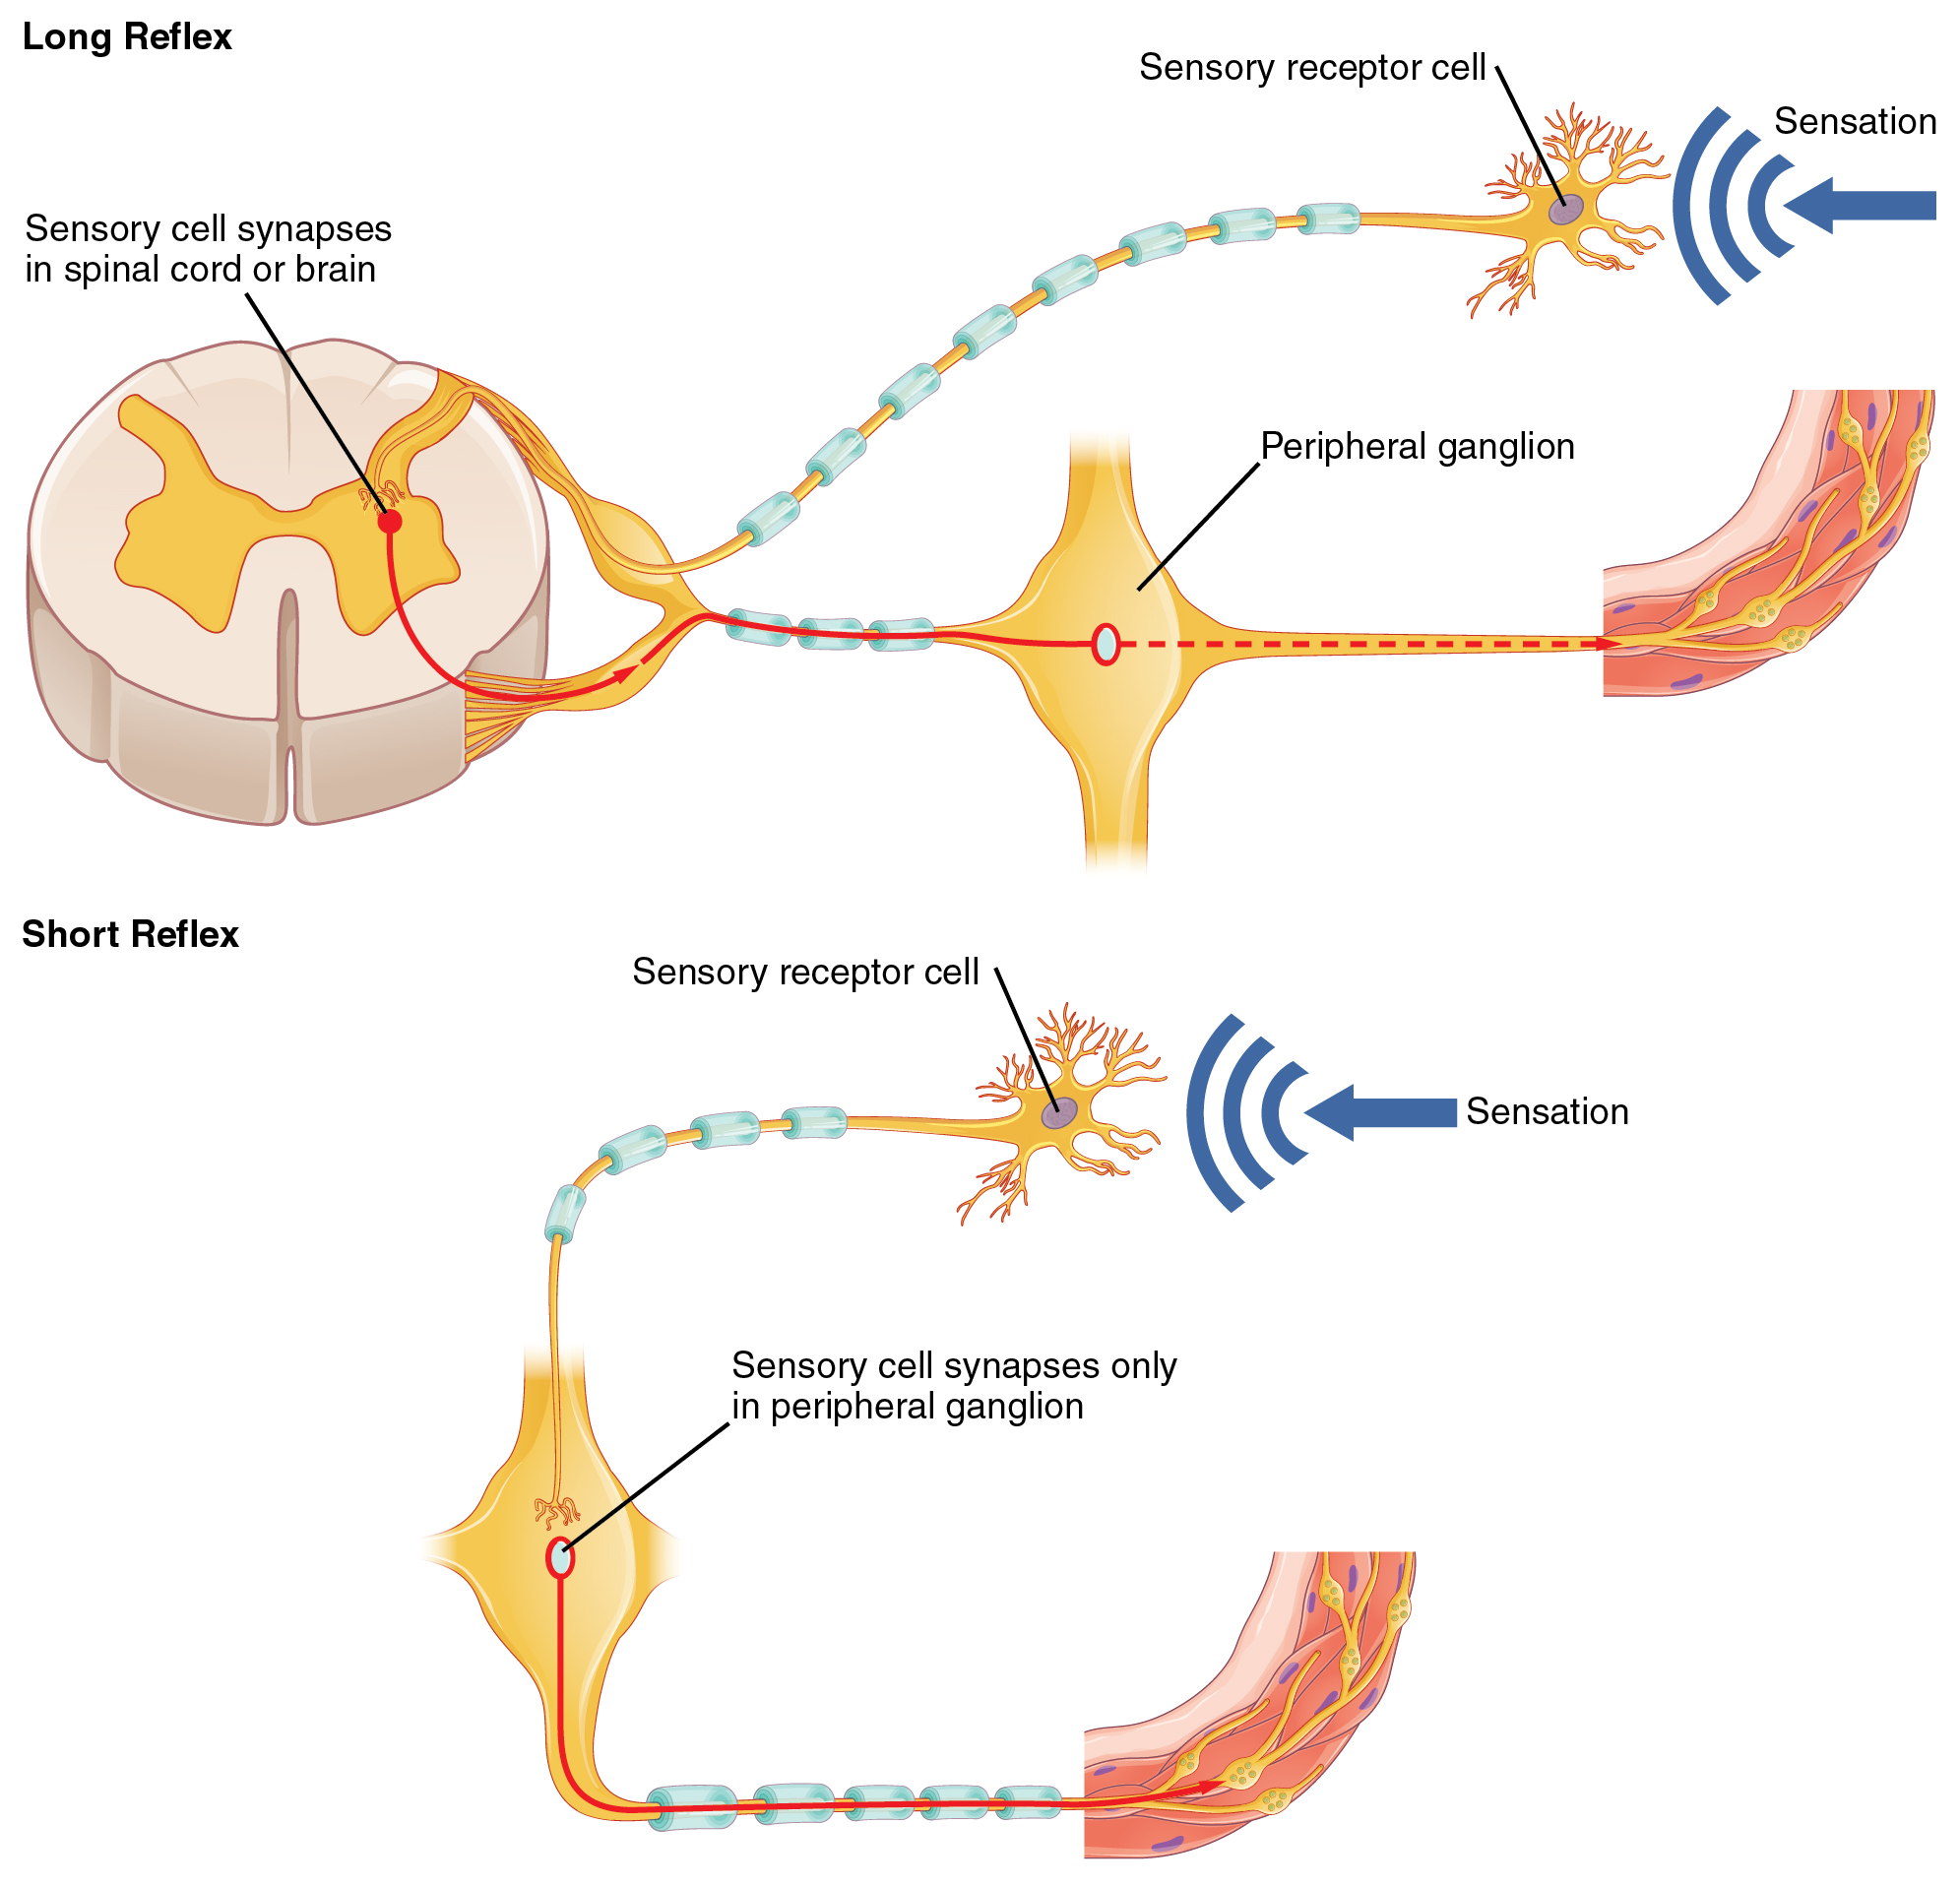 Short and long reflexes autonomic reflexes and homeostasis by short and long reflexes ccuart Choice Image